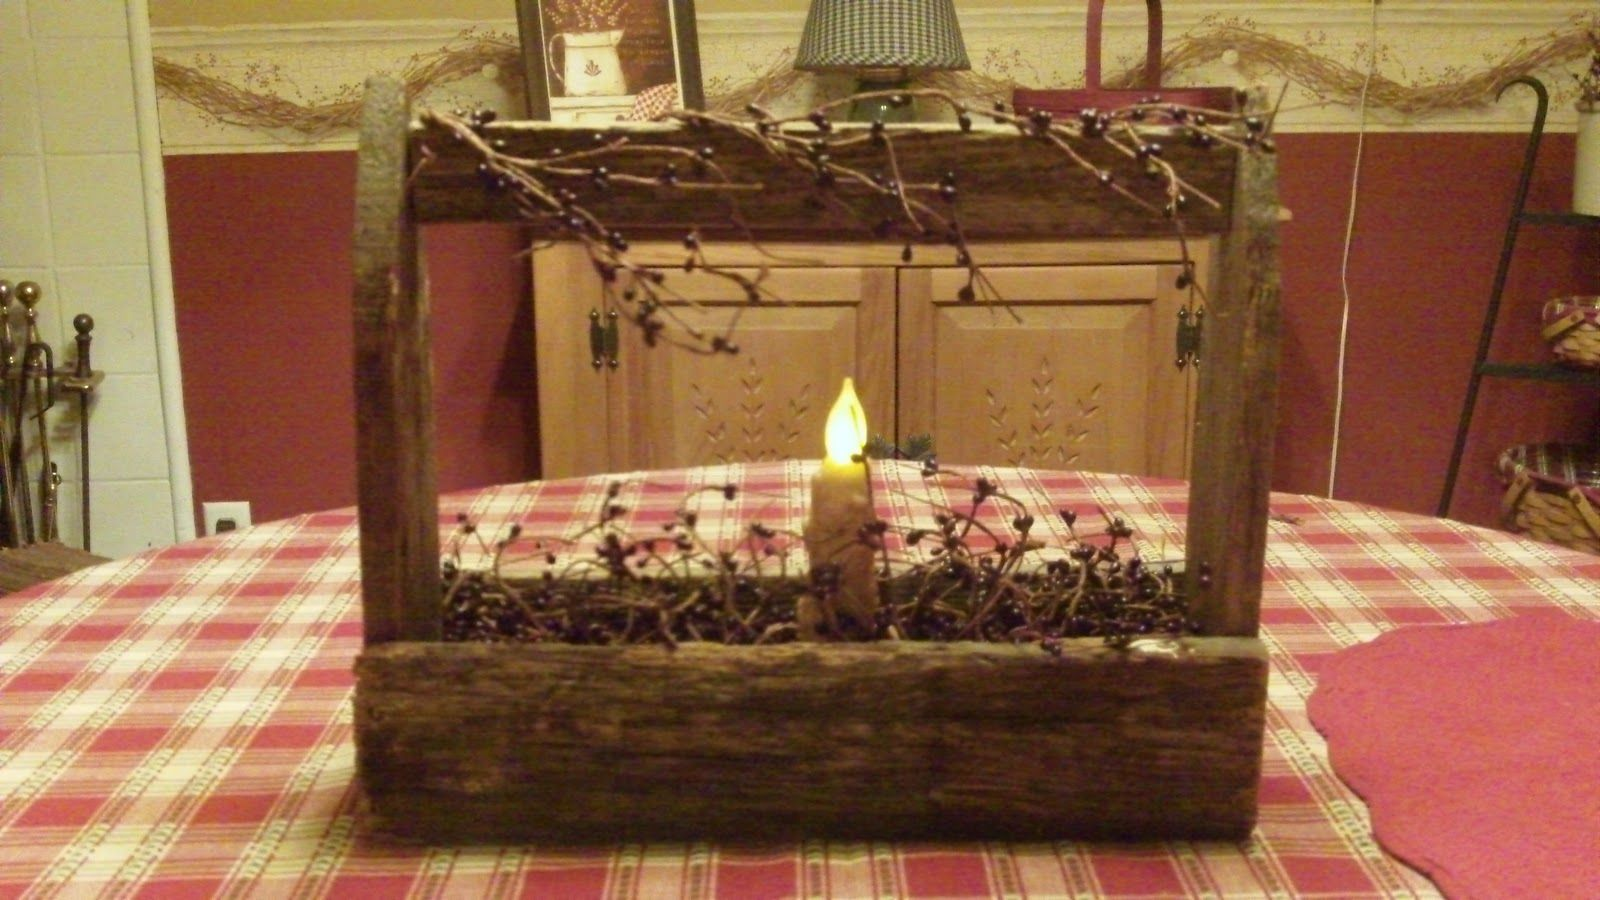 Country Home Decorating Ideas   Primitive Toolbox | Michelleu0027s Country  Corner Primitive Decorations, Primitive Home